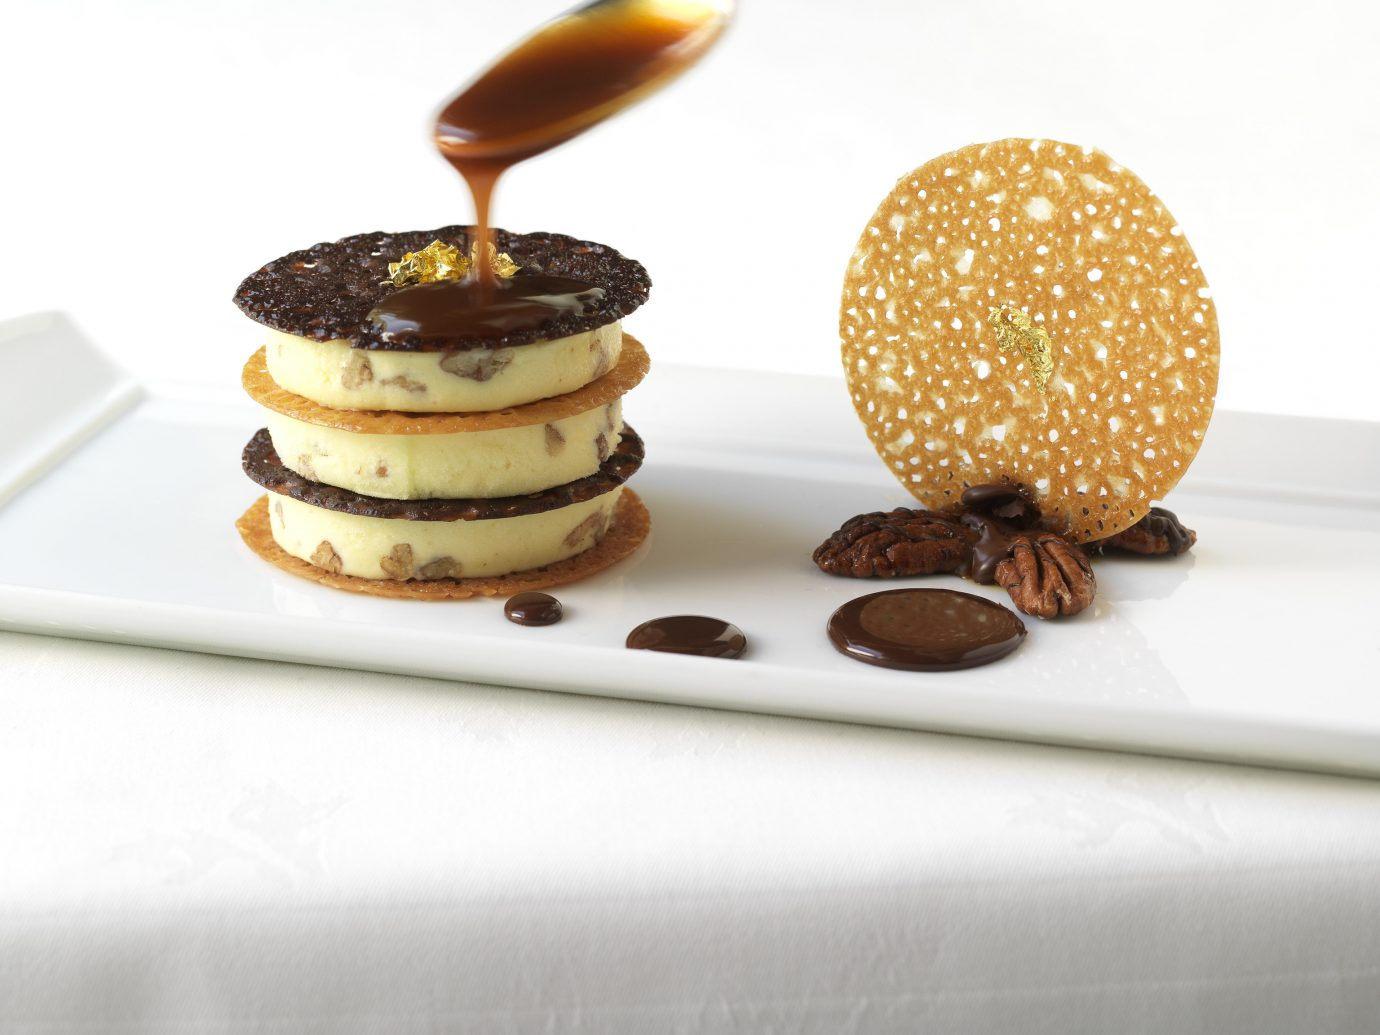 Hotels food plate indoor dish dessert meal breakfast produce snack food flavor